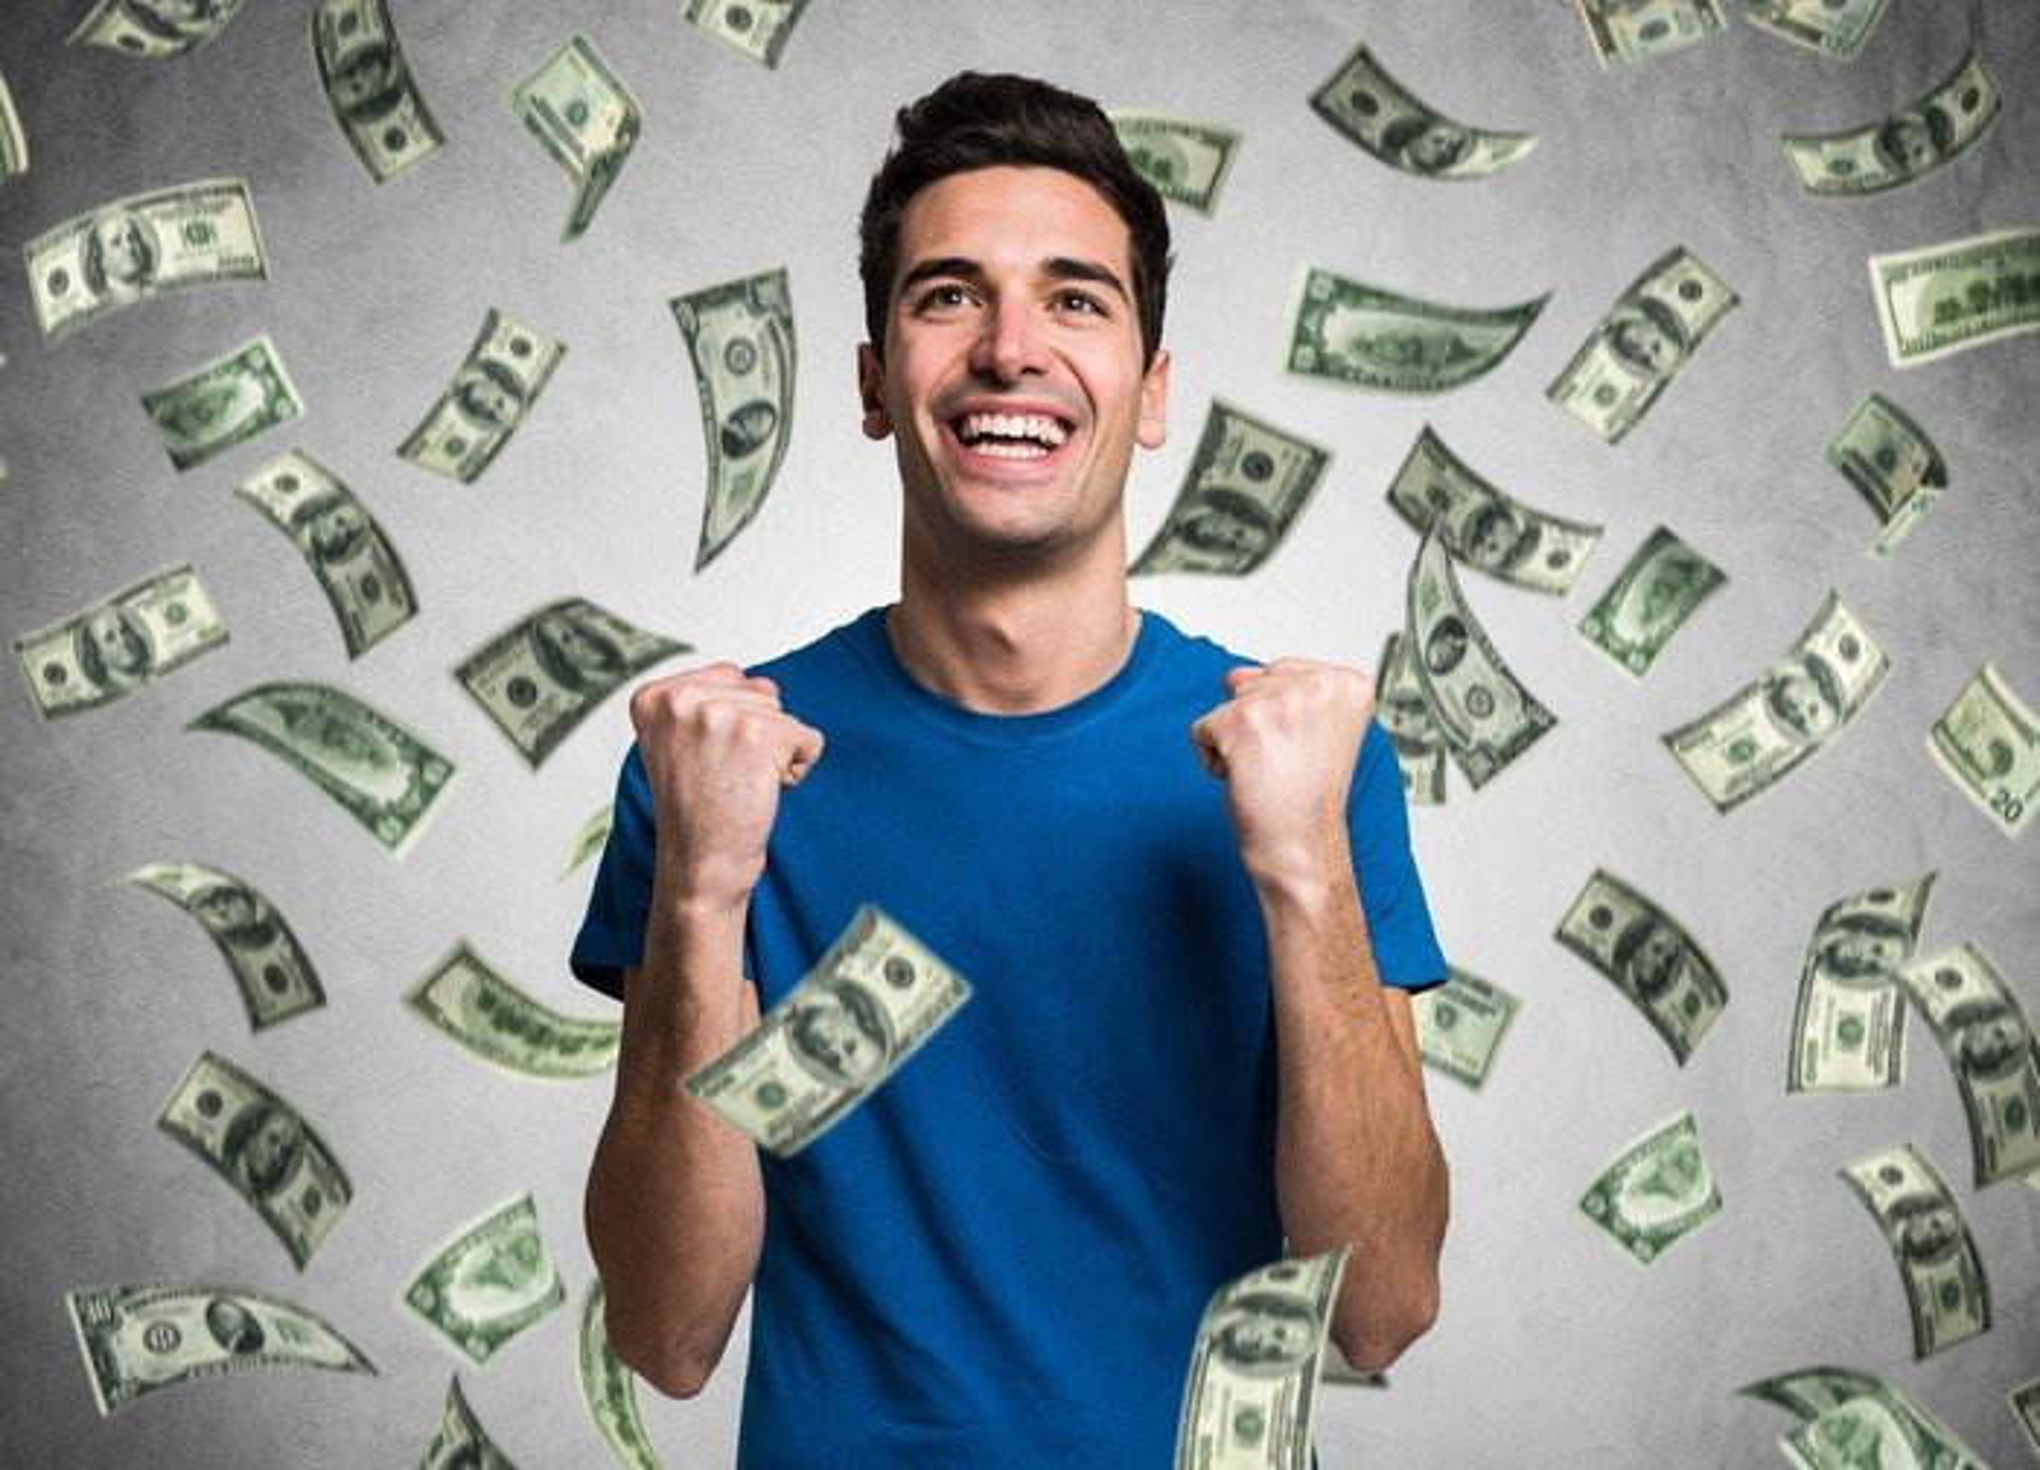 Cash raining down on a smiling man.